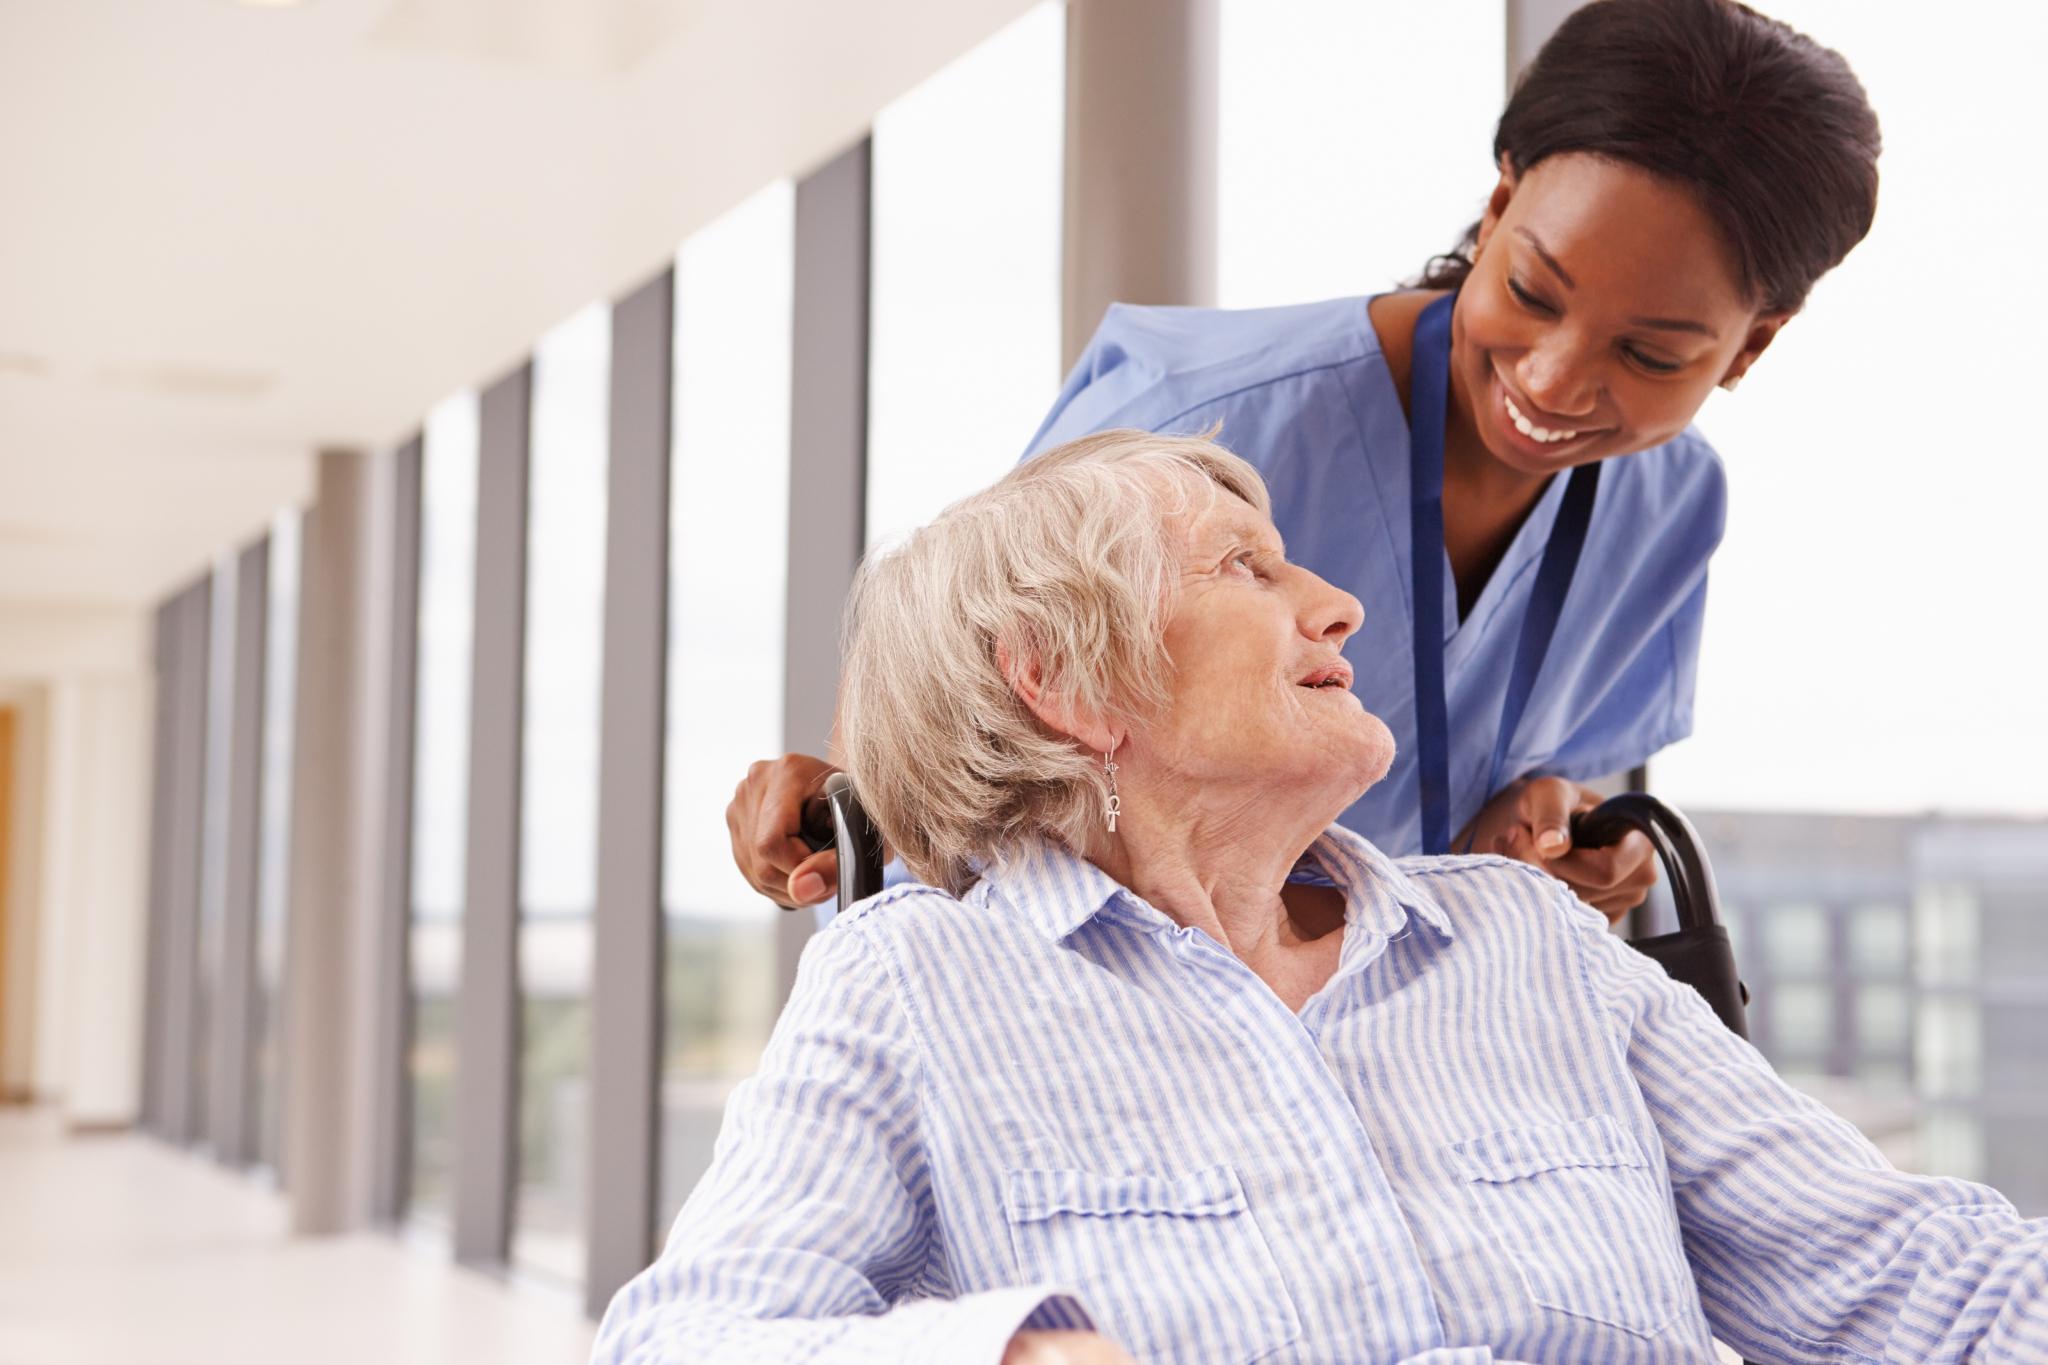 Nurse Pushing Senior Patient In Wheelchair Along Corridor